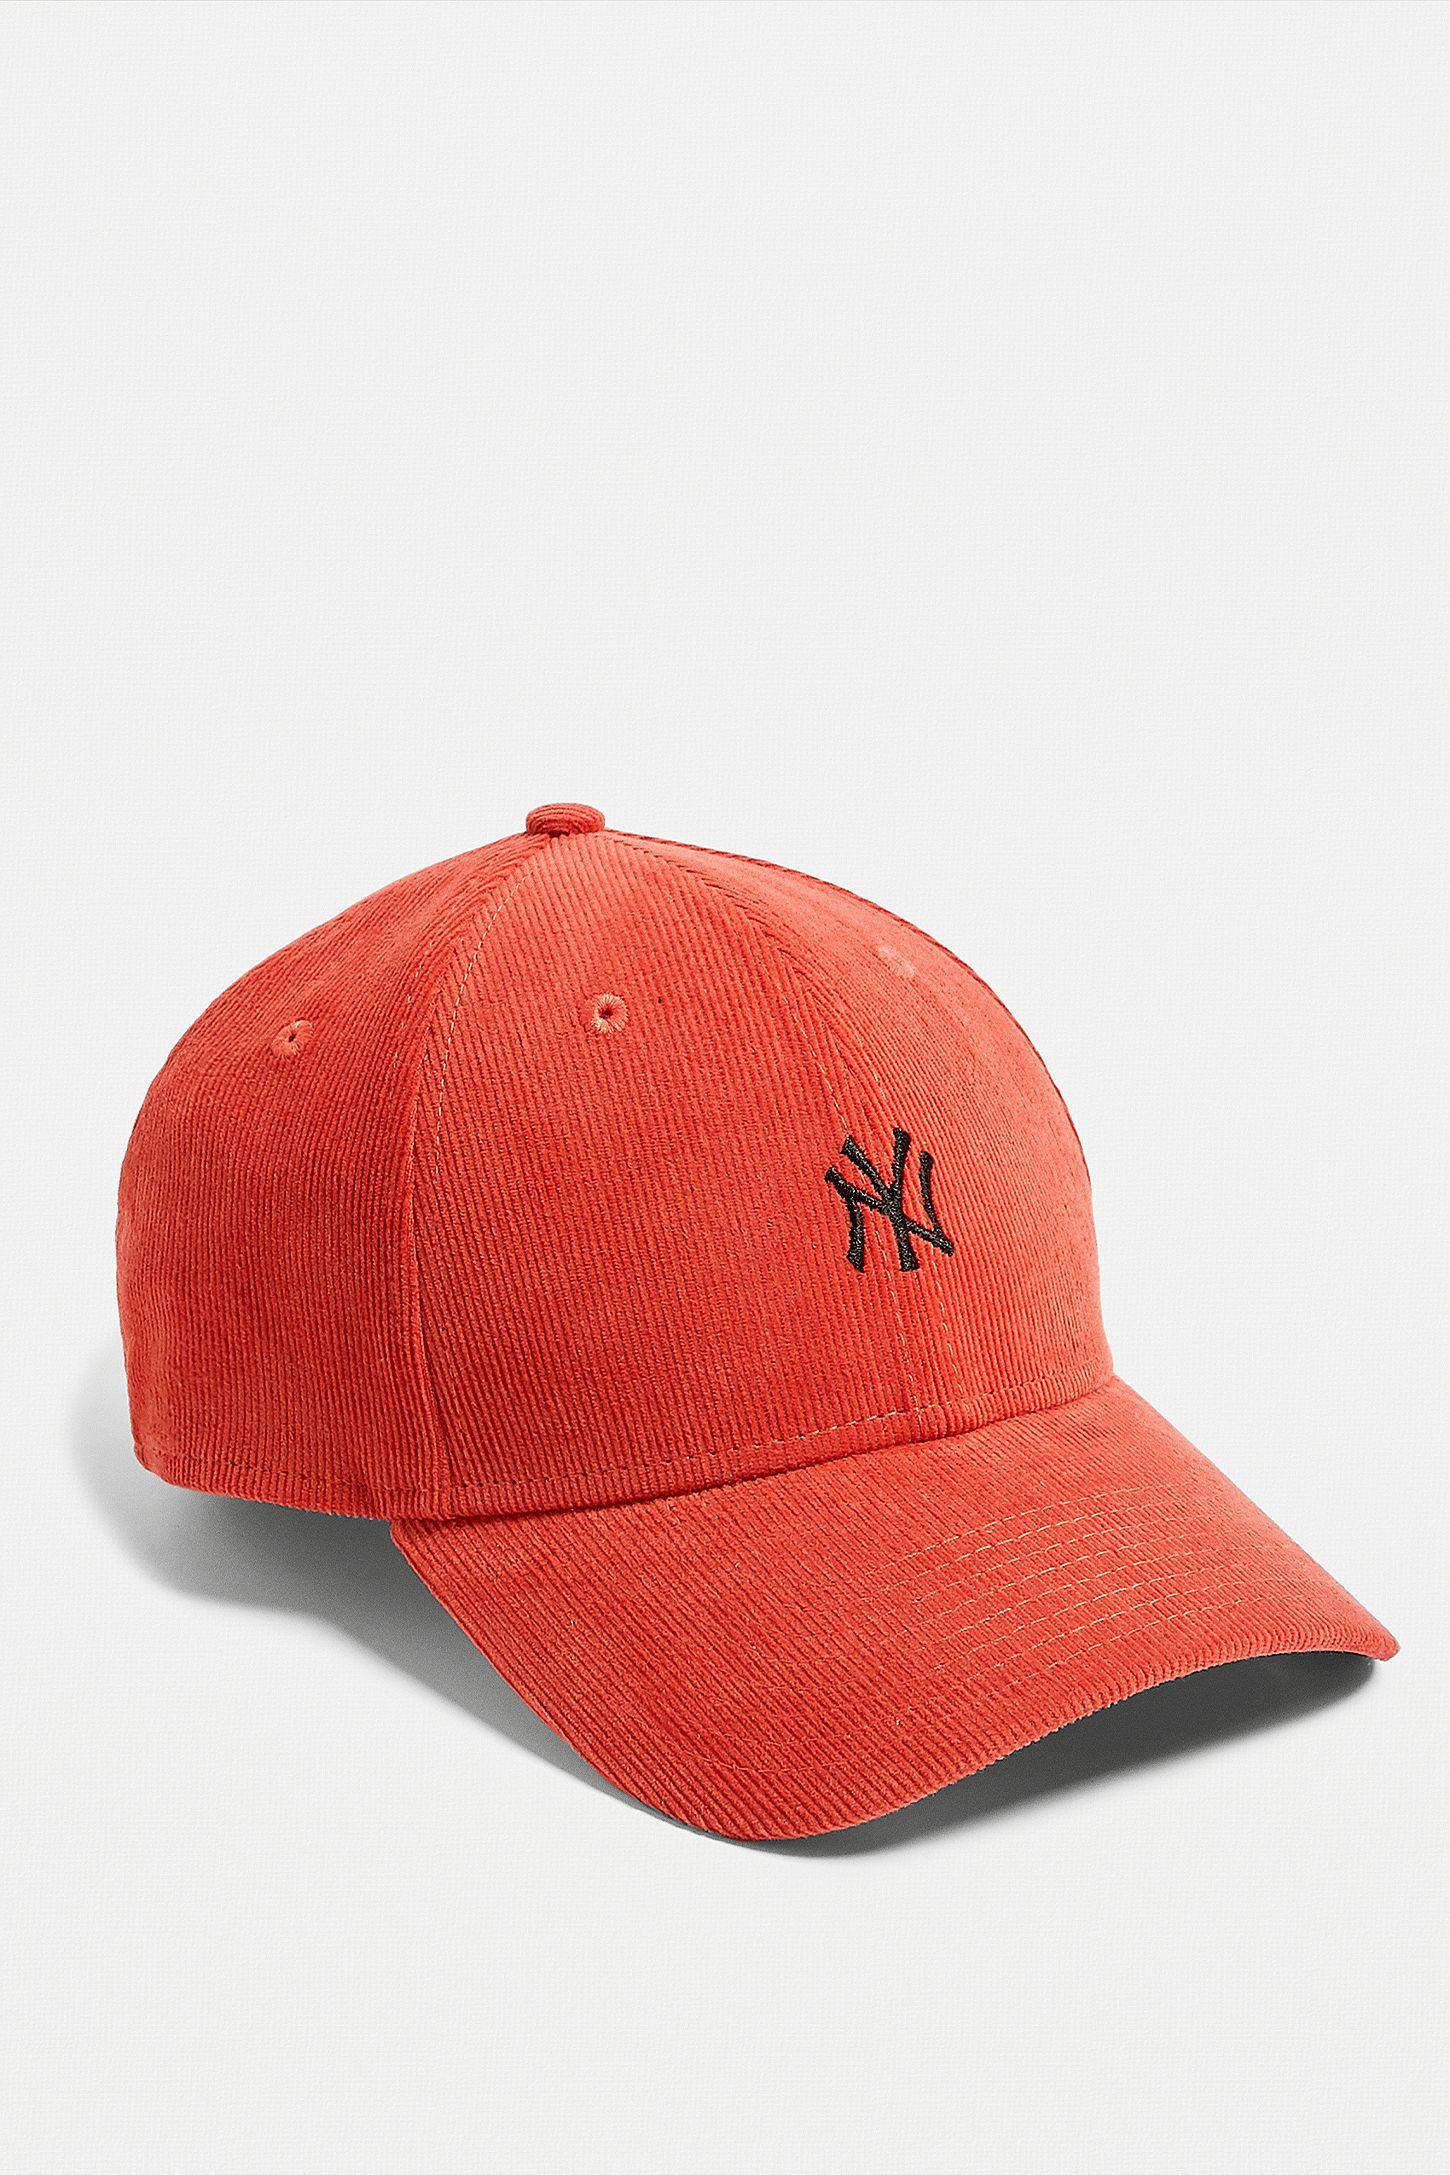 e363b5219ae Slide View  3  New Era NY Yankees Bright Orange Corduroy Cap